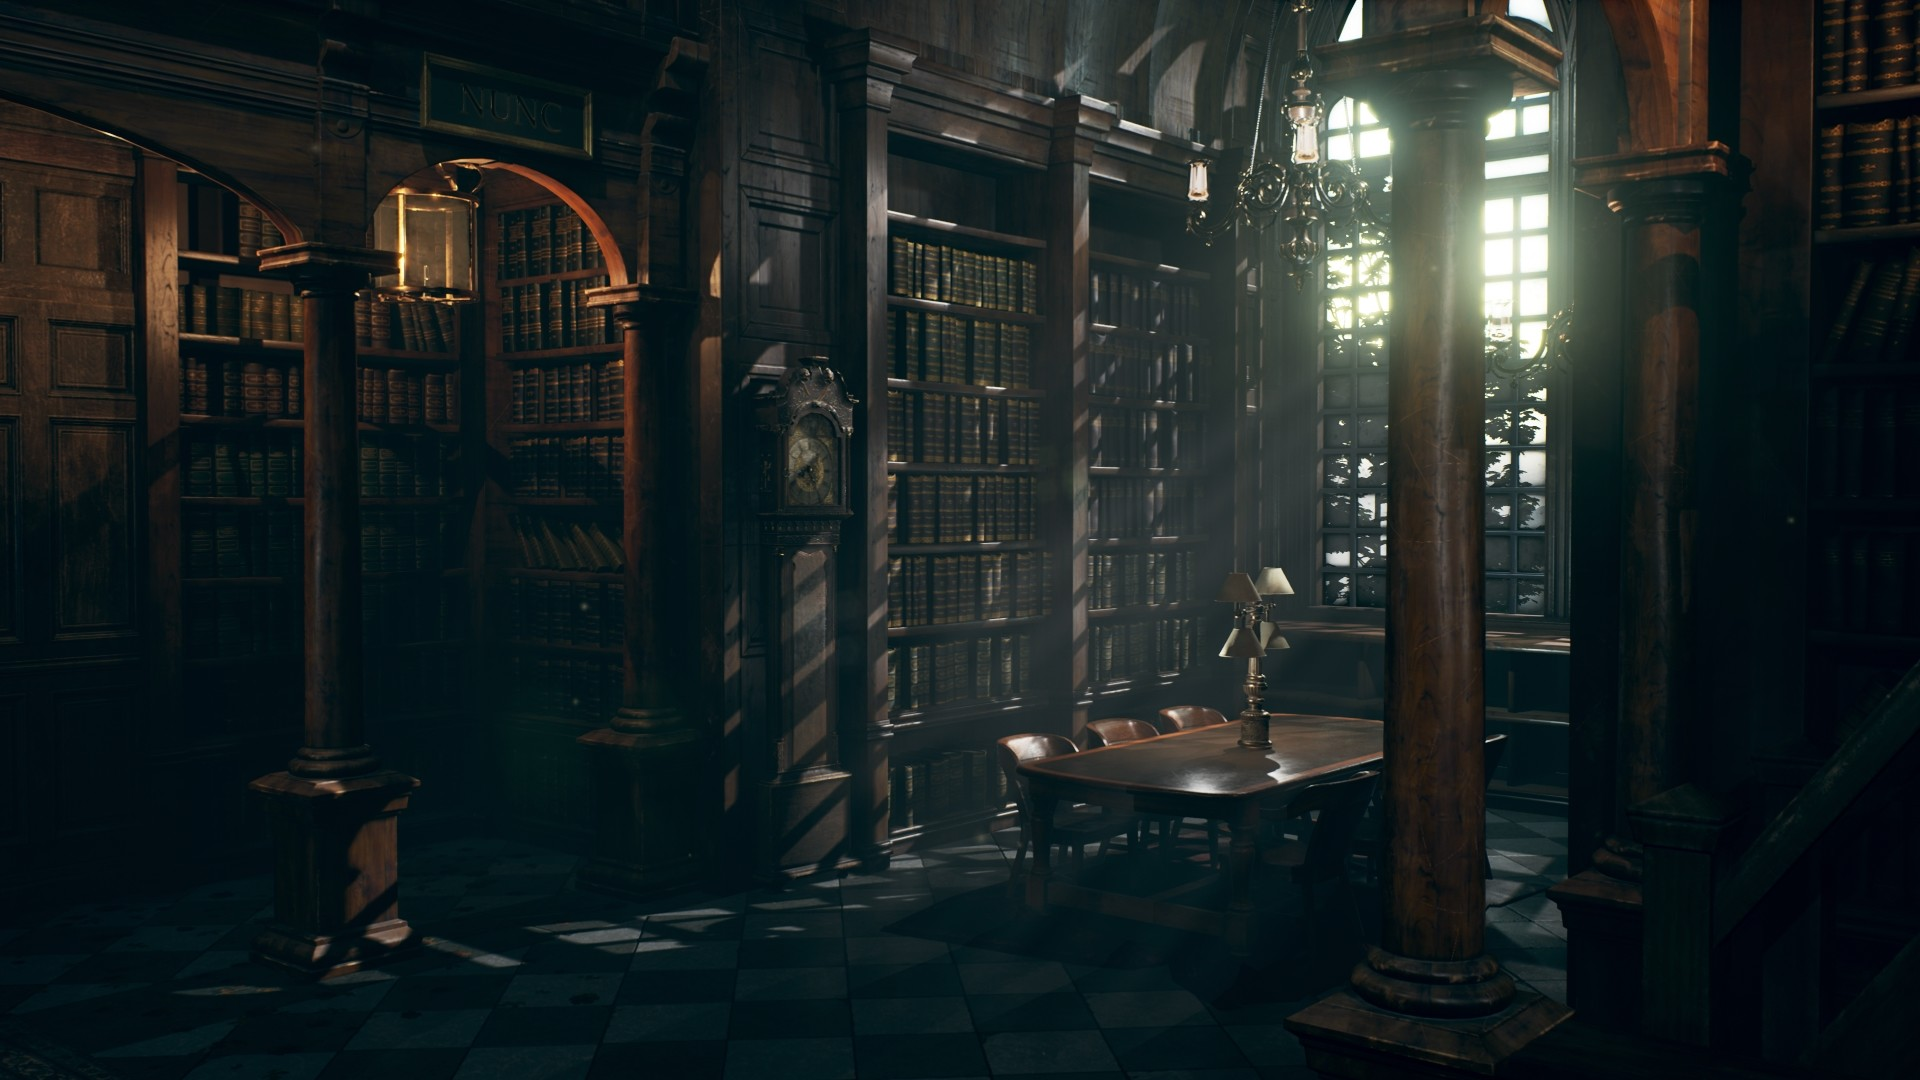 Jayson Kassis Hogwarts Library